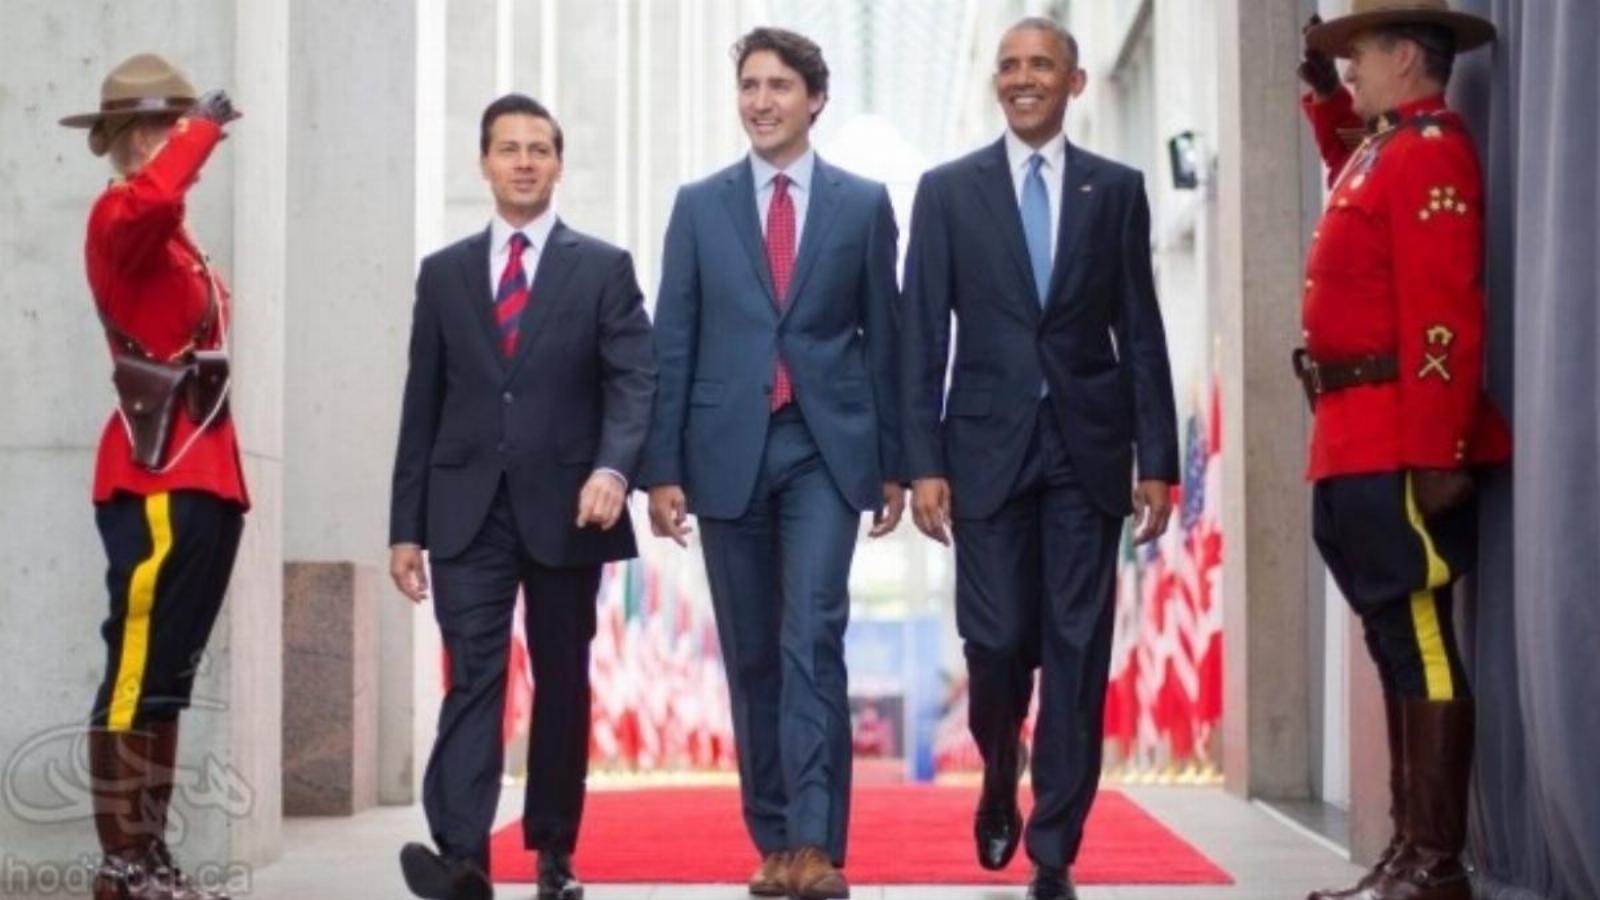 خبر فوری: باراک اوباما ساعاتی پیش وارد کانادا شد